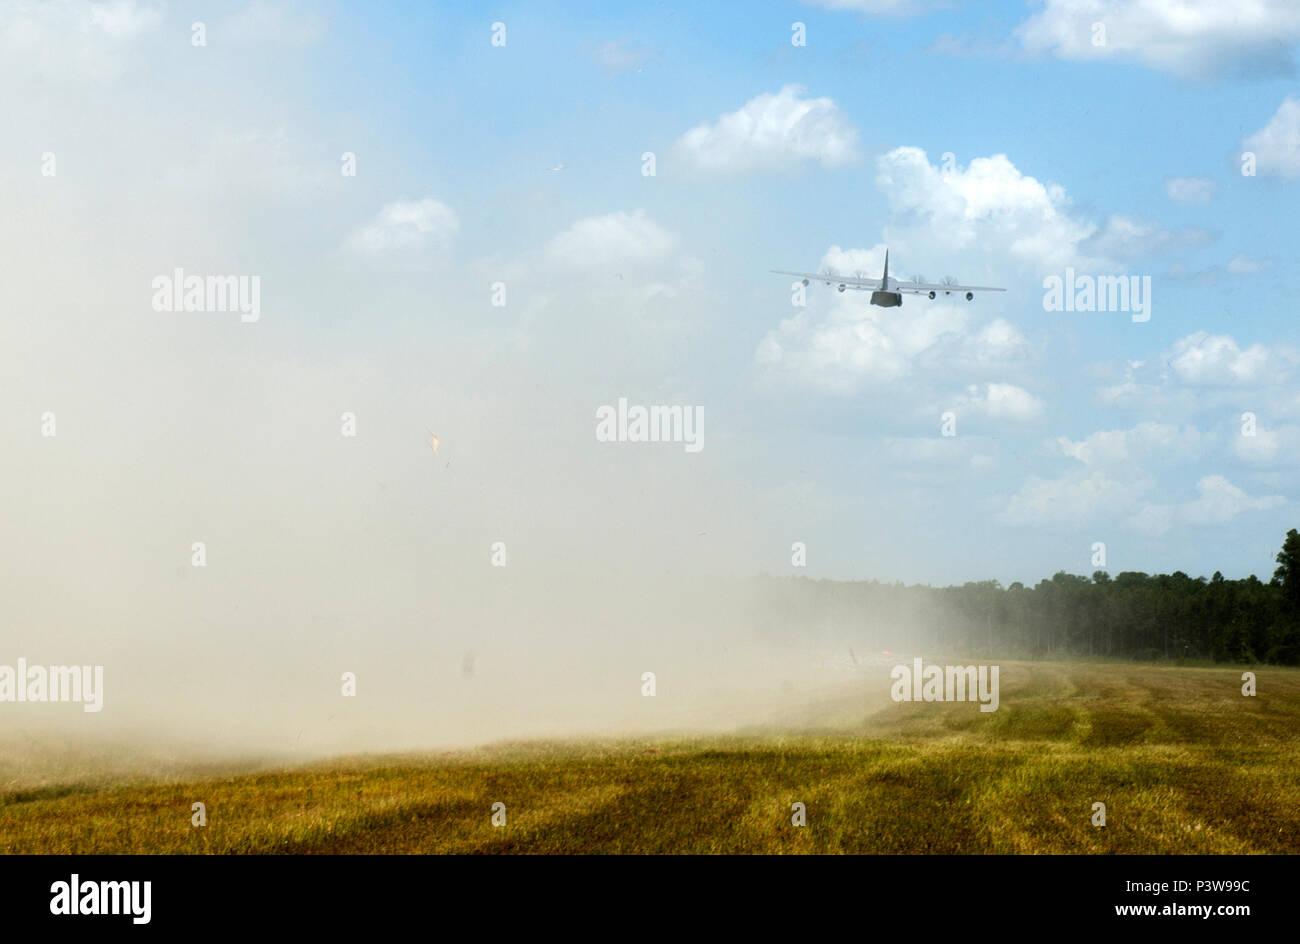 Austere Landing Zone Stock Photos & Austere Landing Zone